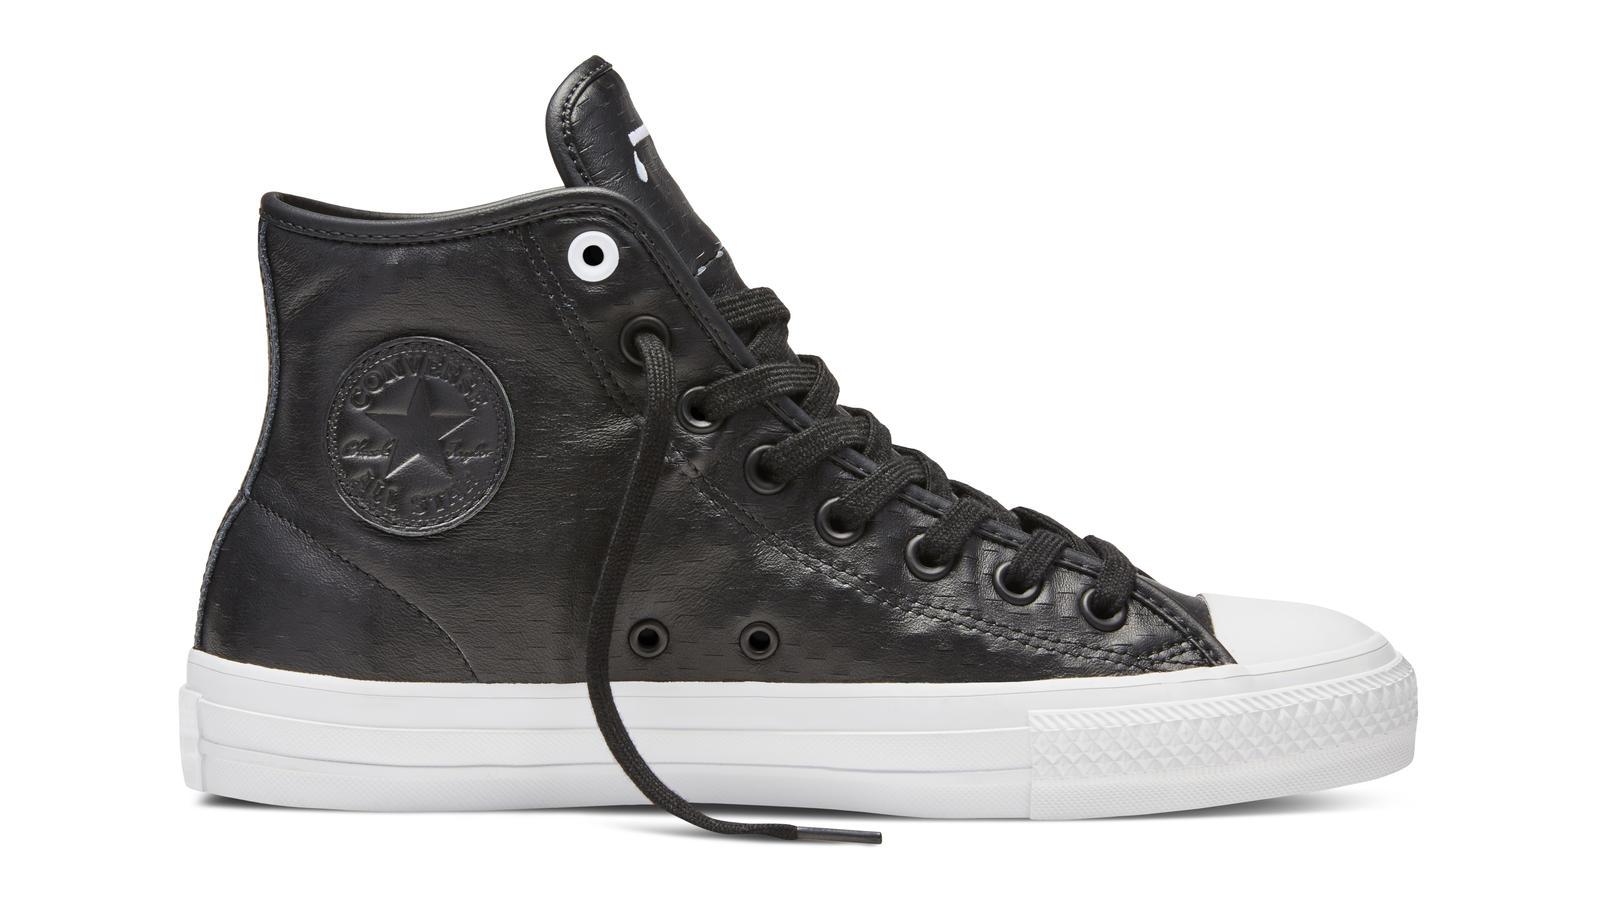 7875e8e43f47b4 Chuck Taylor All Star Ben-G - Nike News